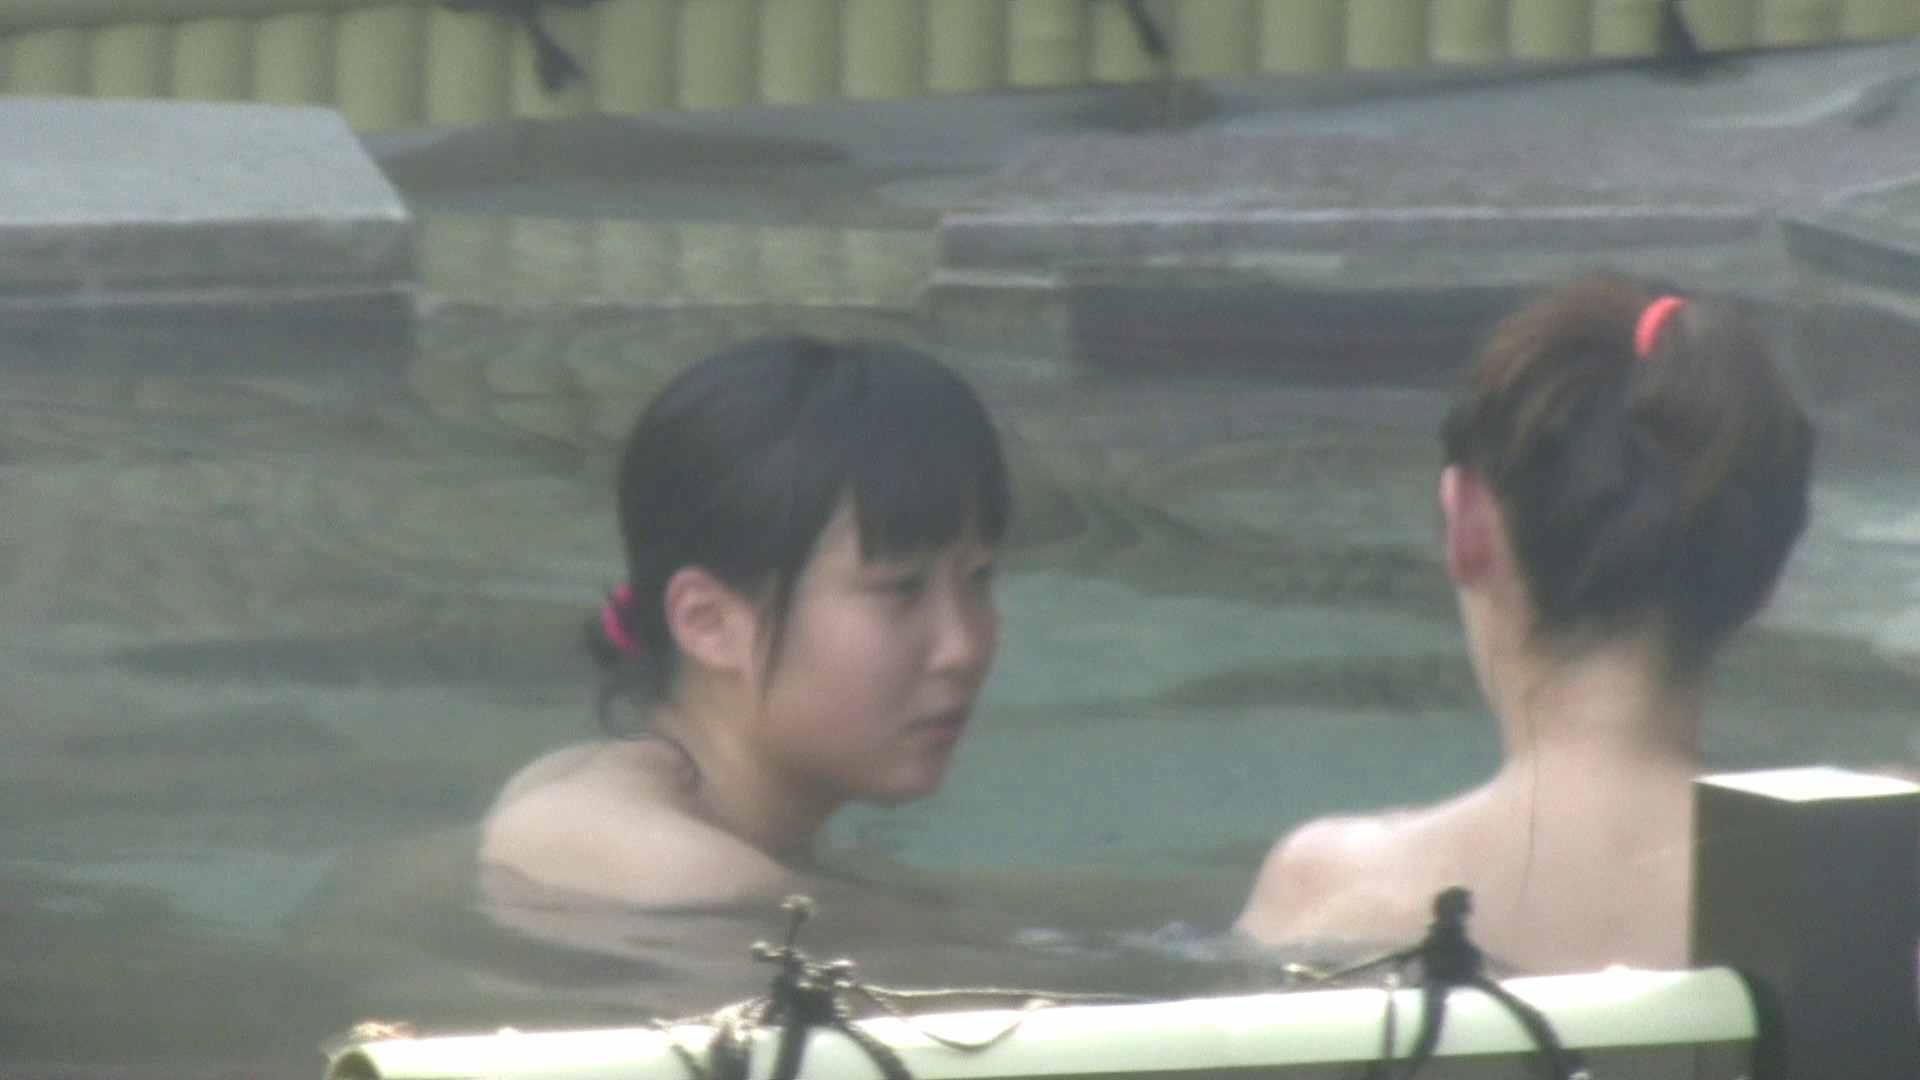 Aquaな露天風呂Vol.196 盗撮シリーズ | 露天風呂編  87PIX 79